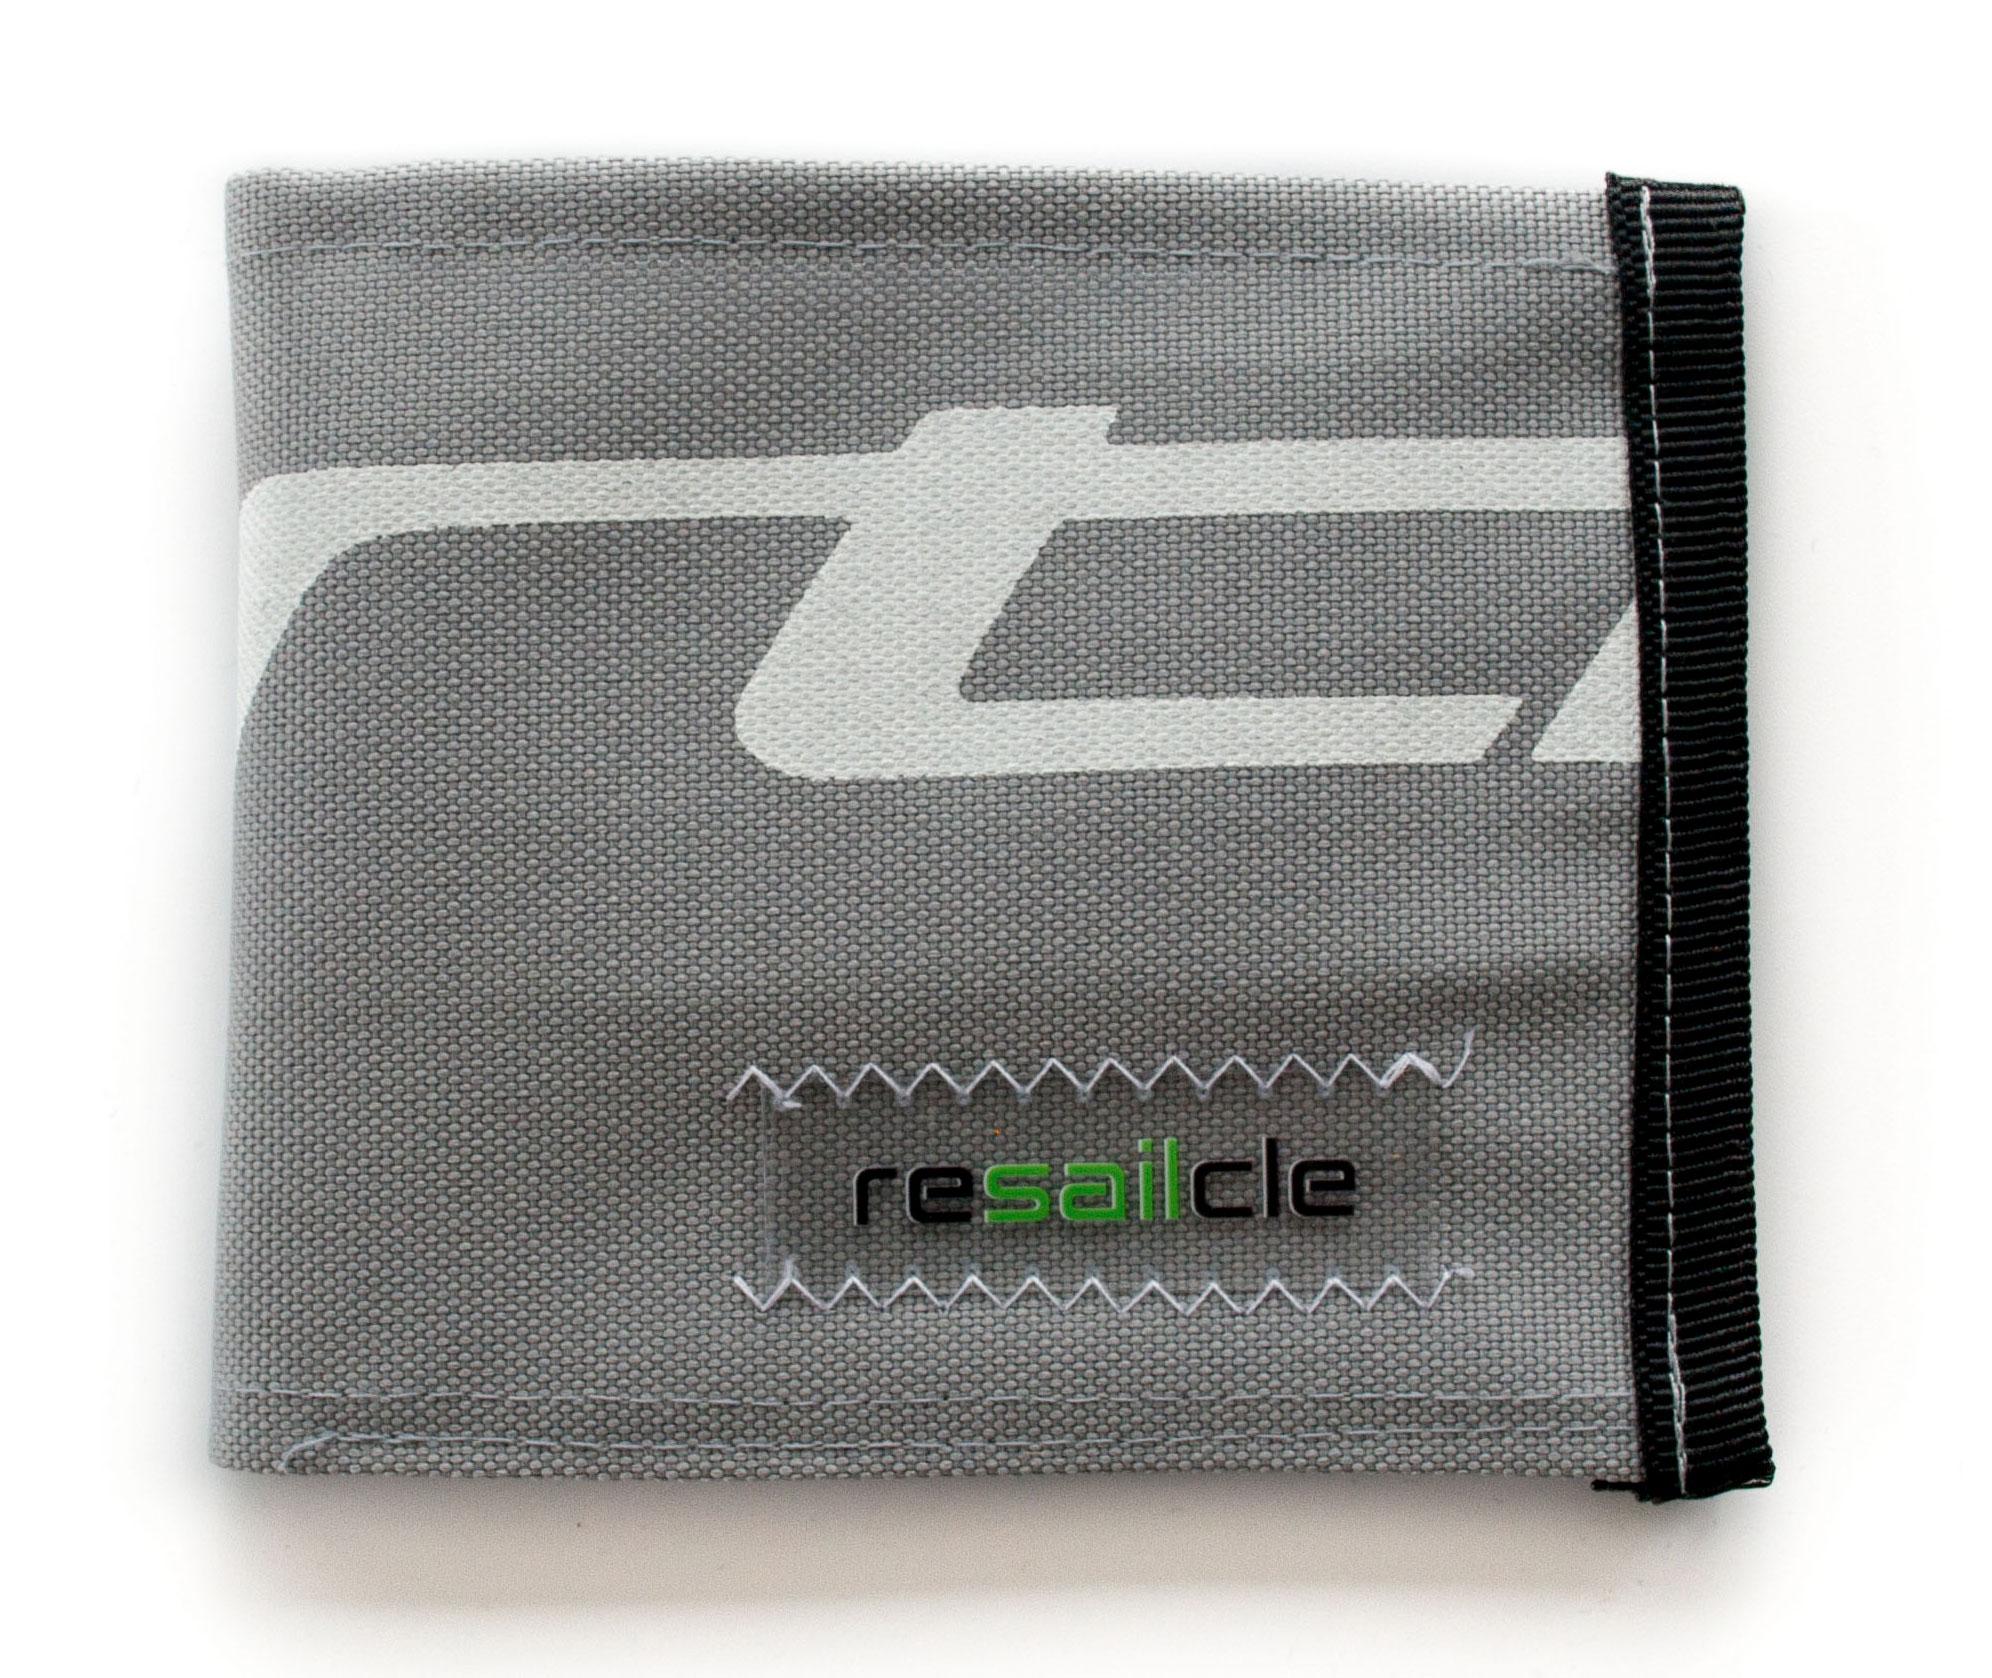 ReSailCle - Volt 5.3 pénztárca